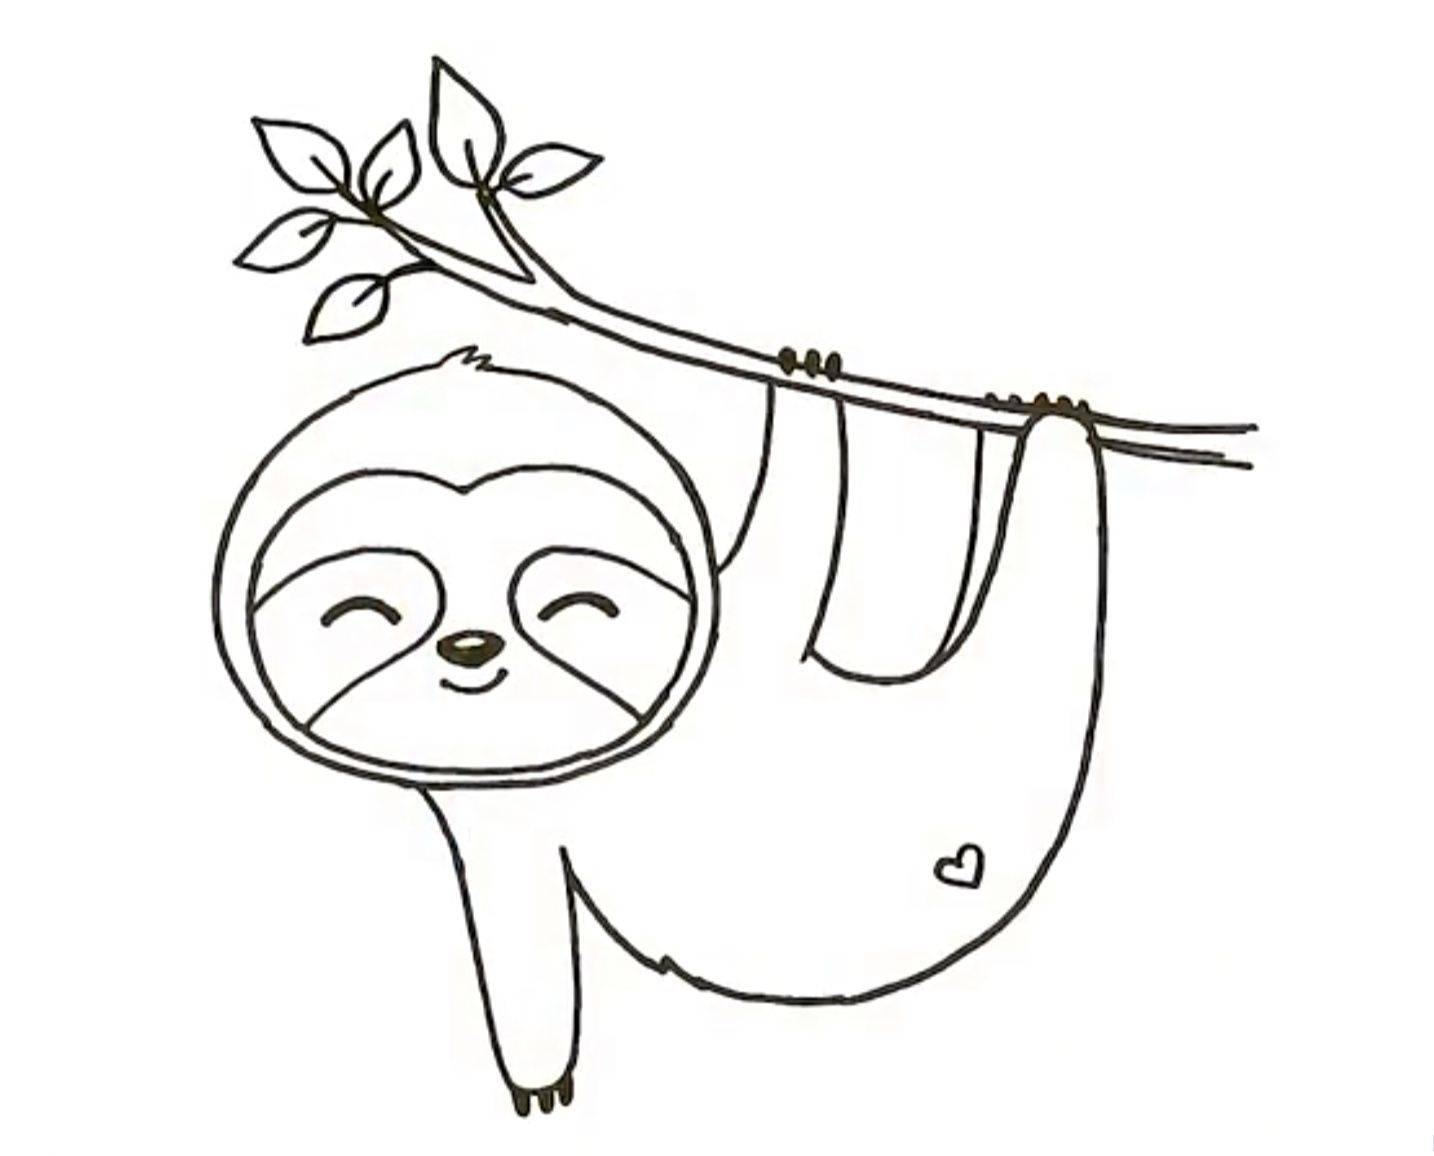 Pin By Kim Kelpe On Book Carving Burning Cute Easy Drawings Kawaii Drawings Cute Drawings